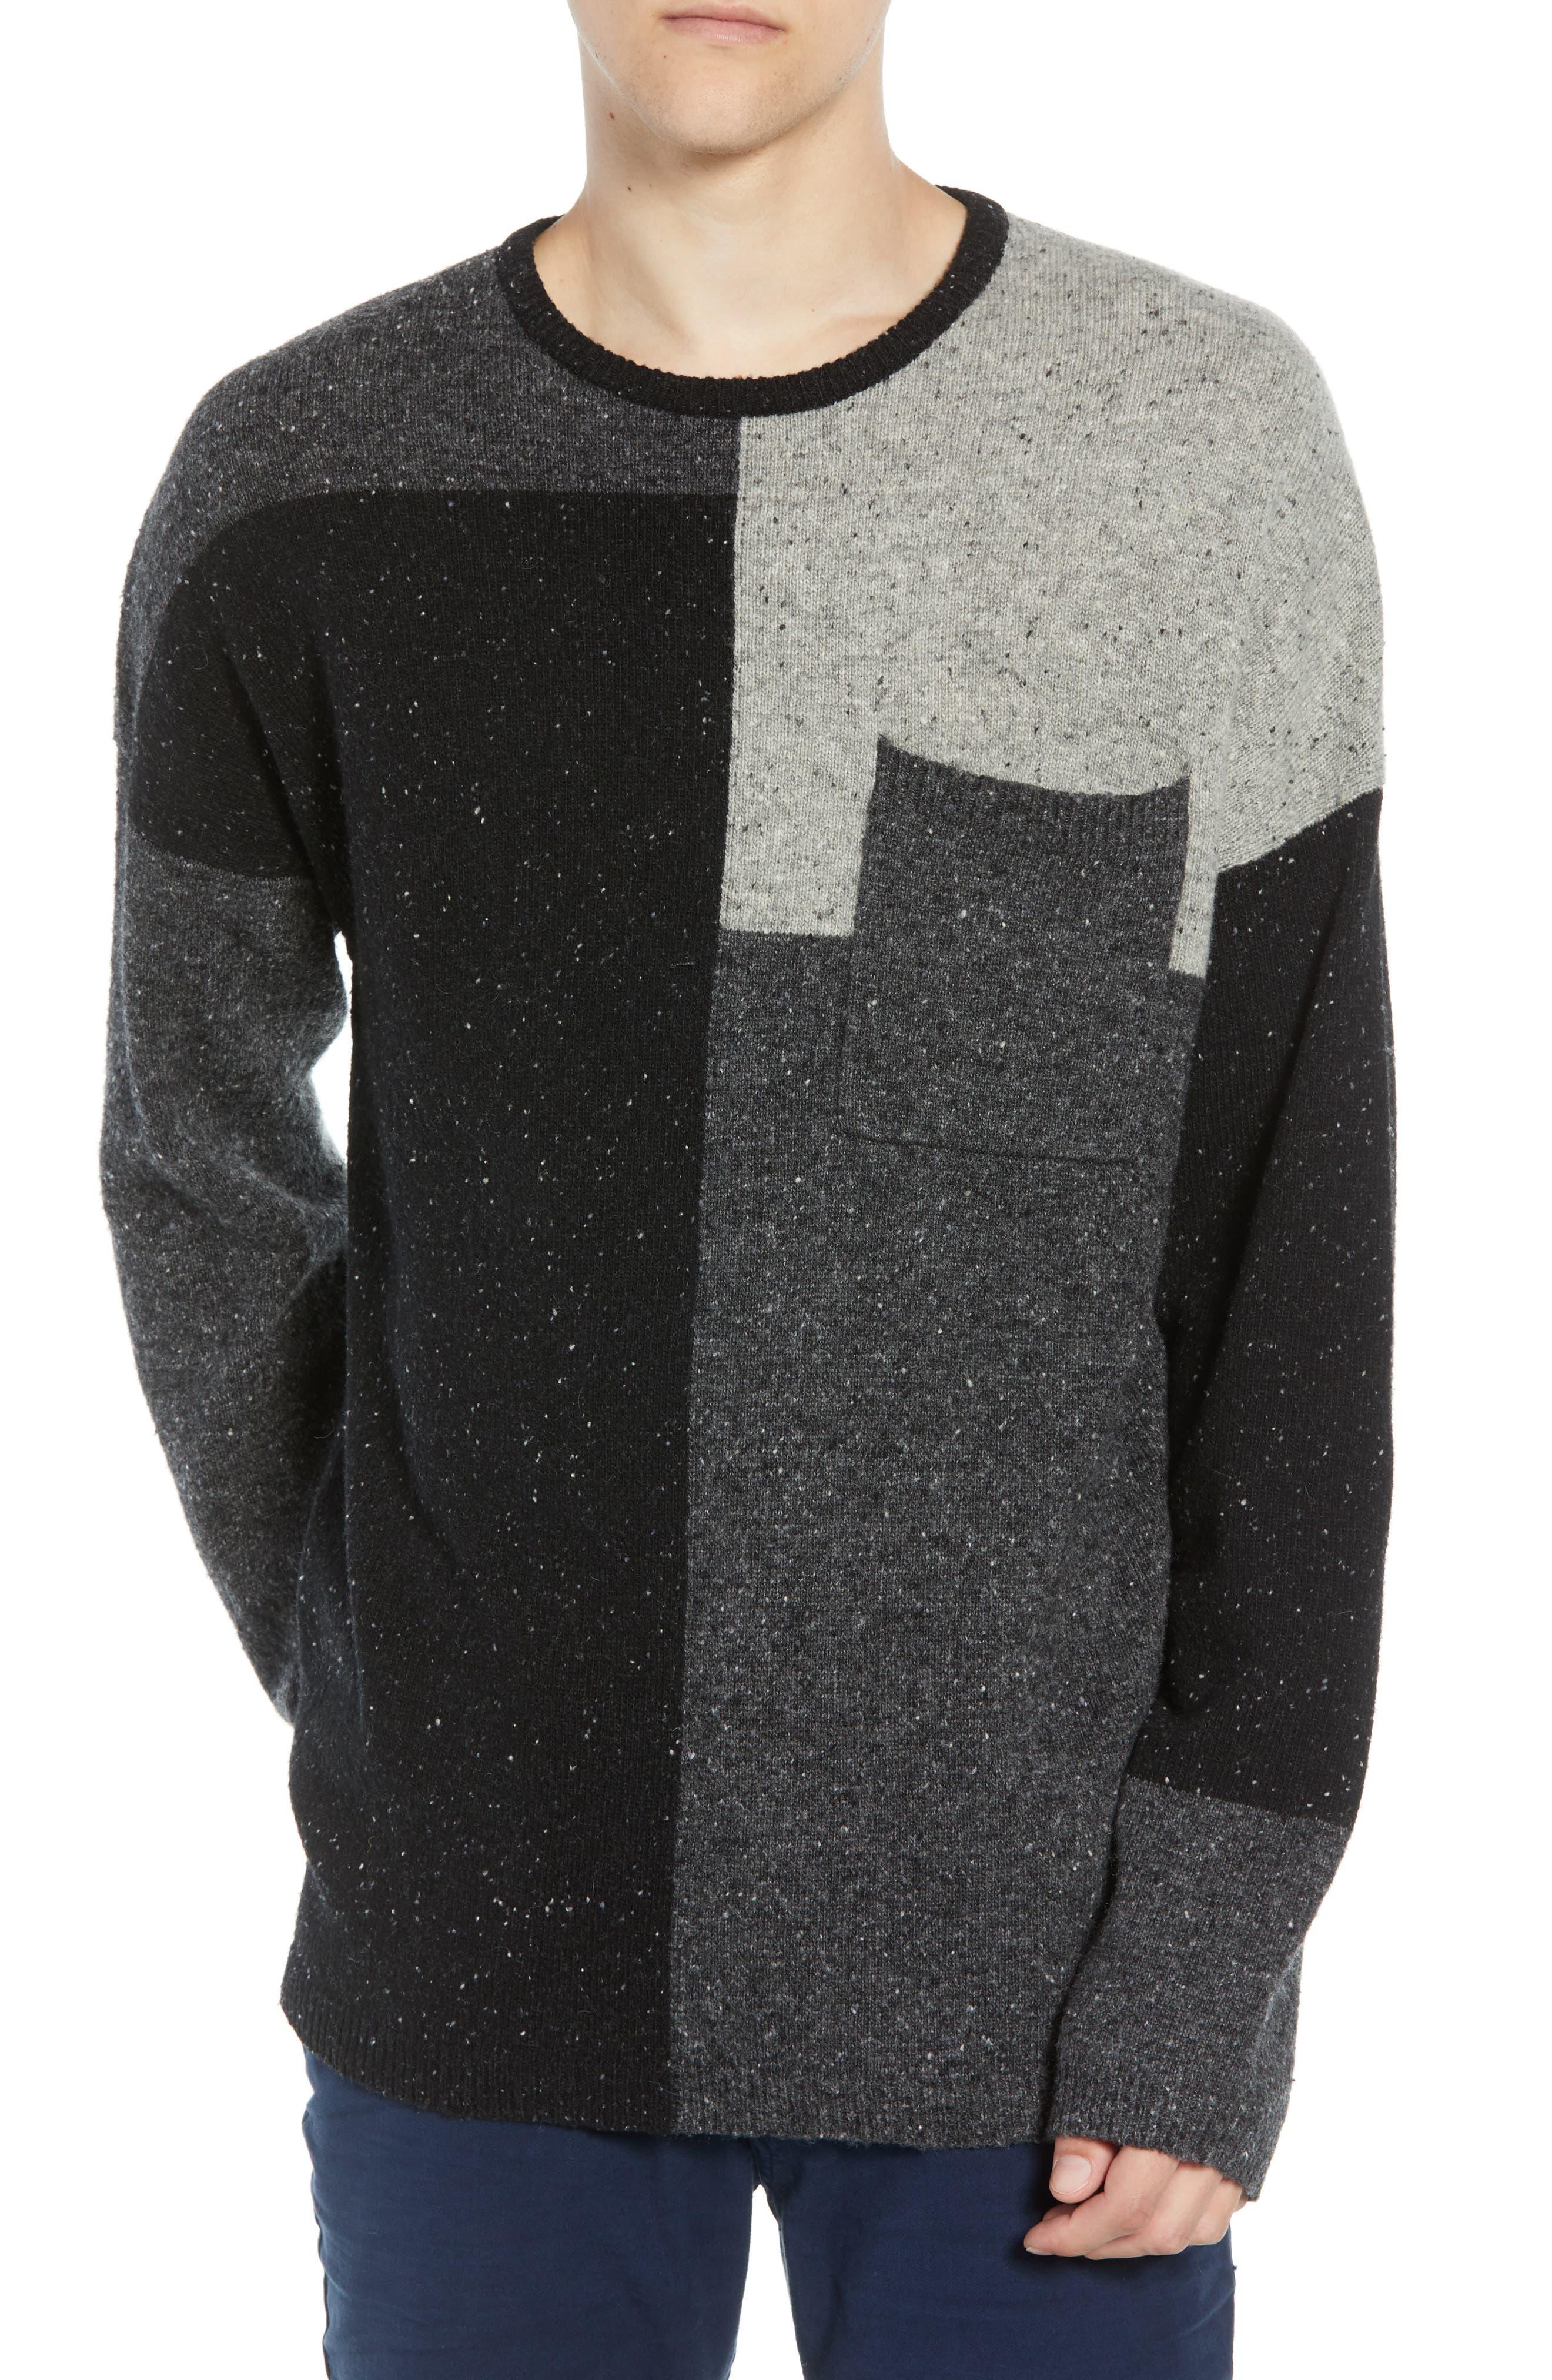 Patchwork Donegal Wool Blend Sweater,                         Main,                         color, LIGHT GREY MELANGE CHARCOAL